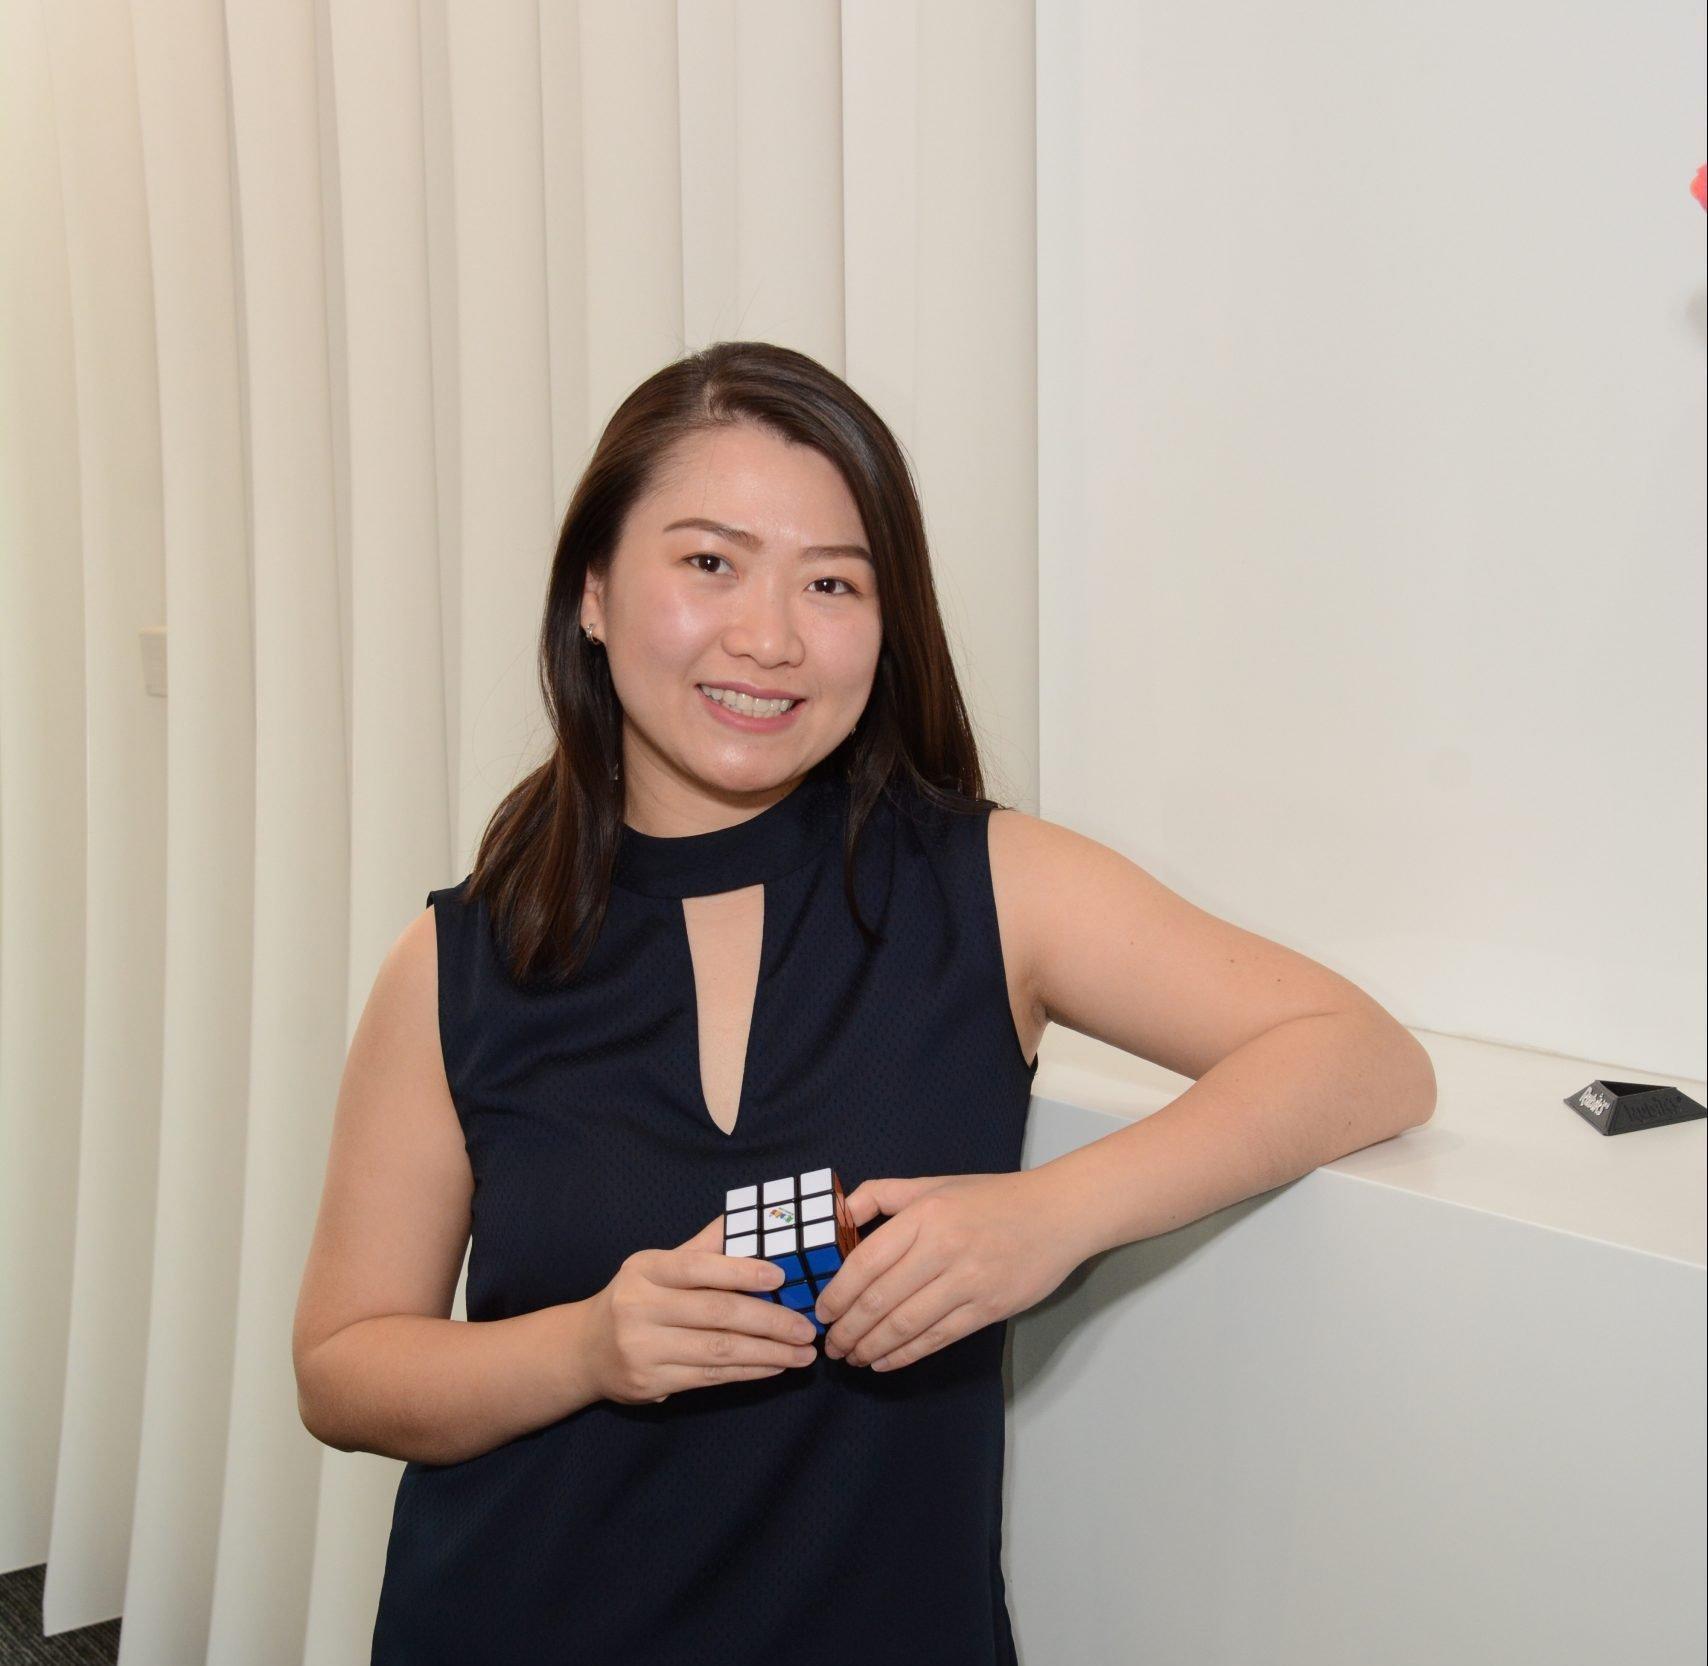 Tien - :Lab Technician at Lidums Dental